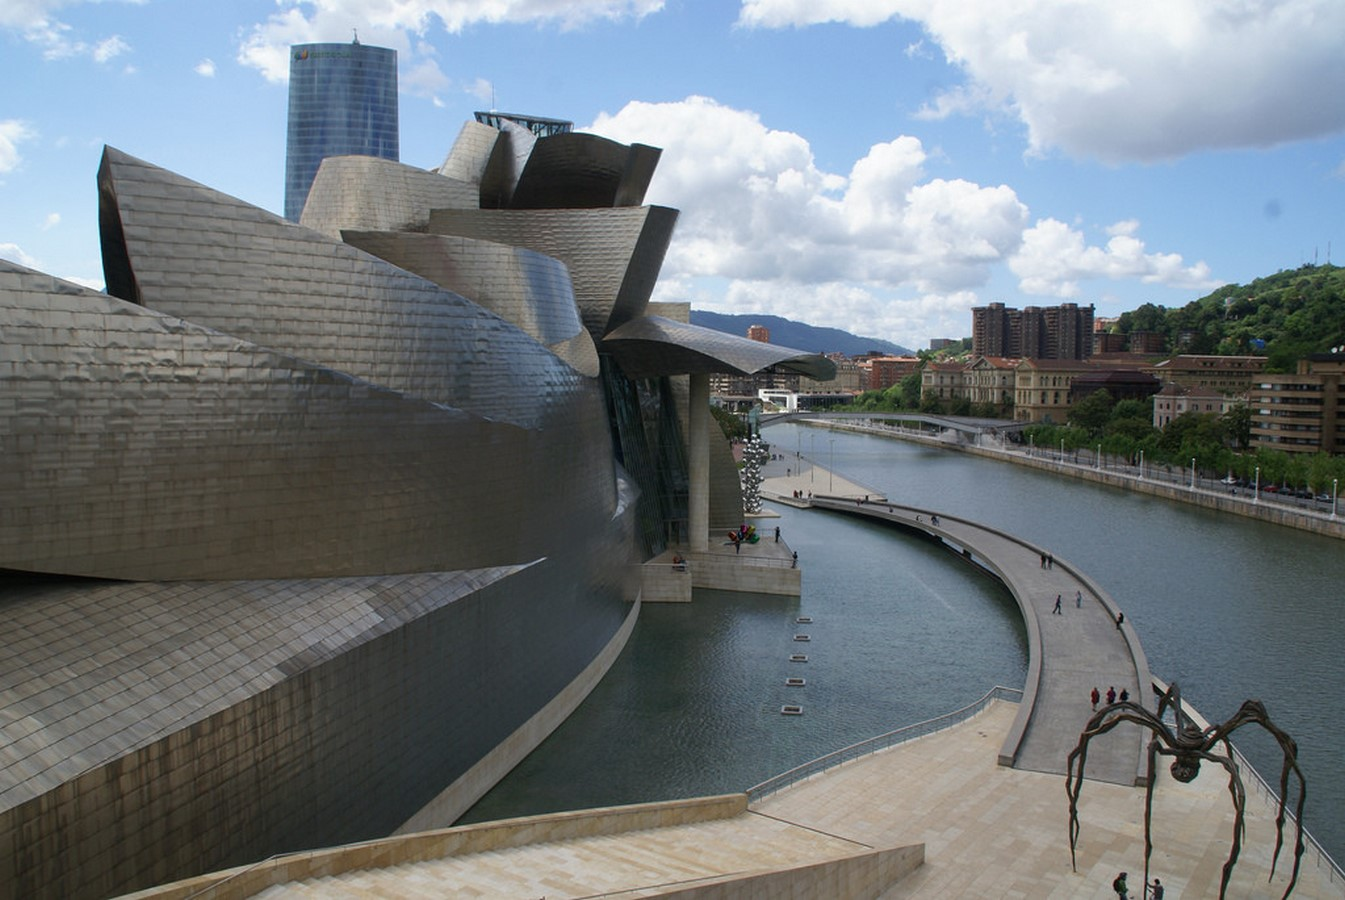 Guggenheim Museum, Bilbao, Spain - Sheet2